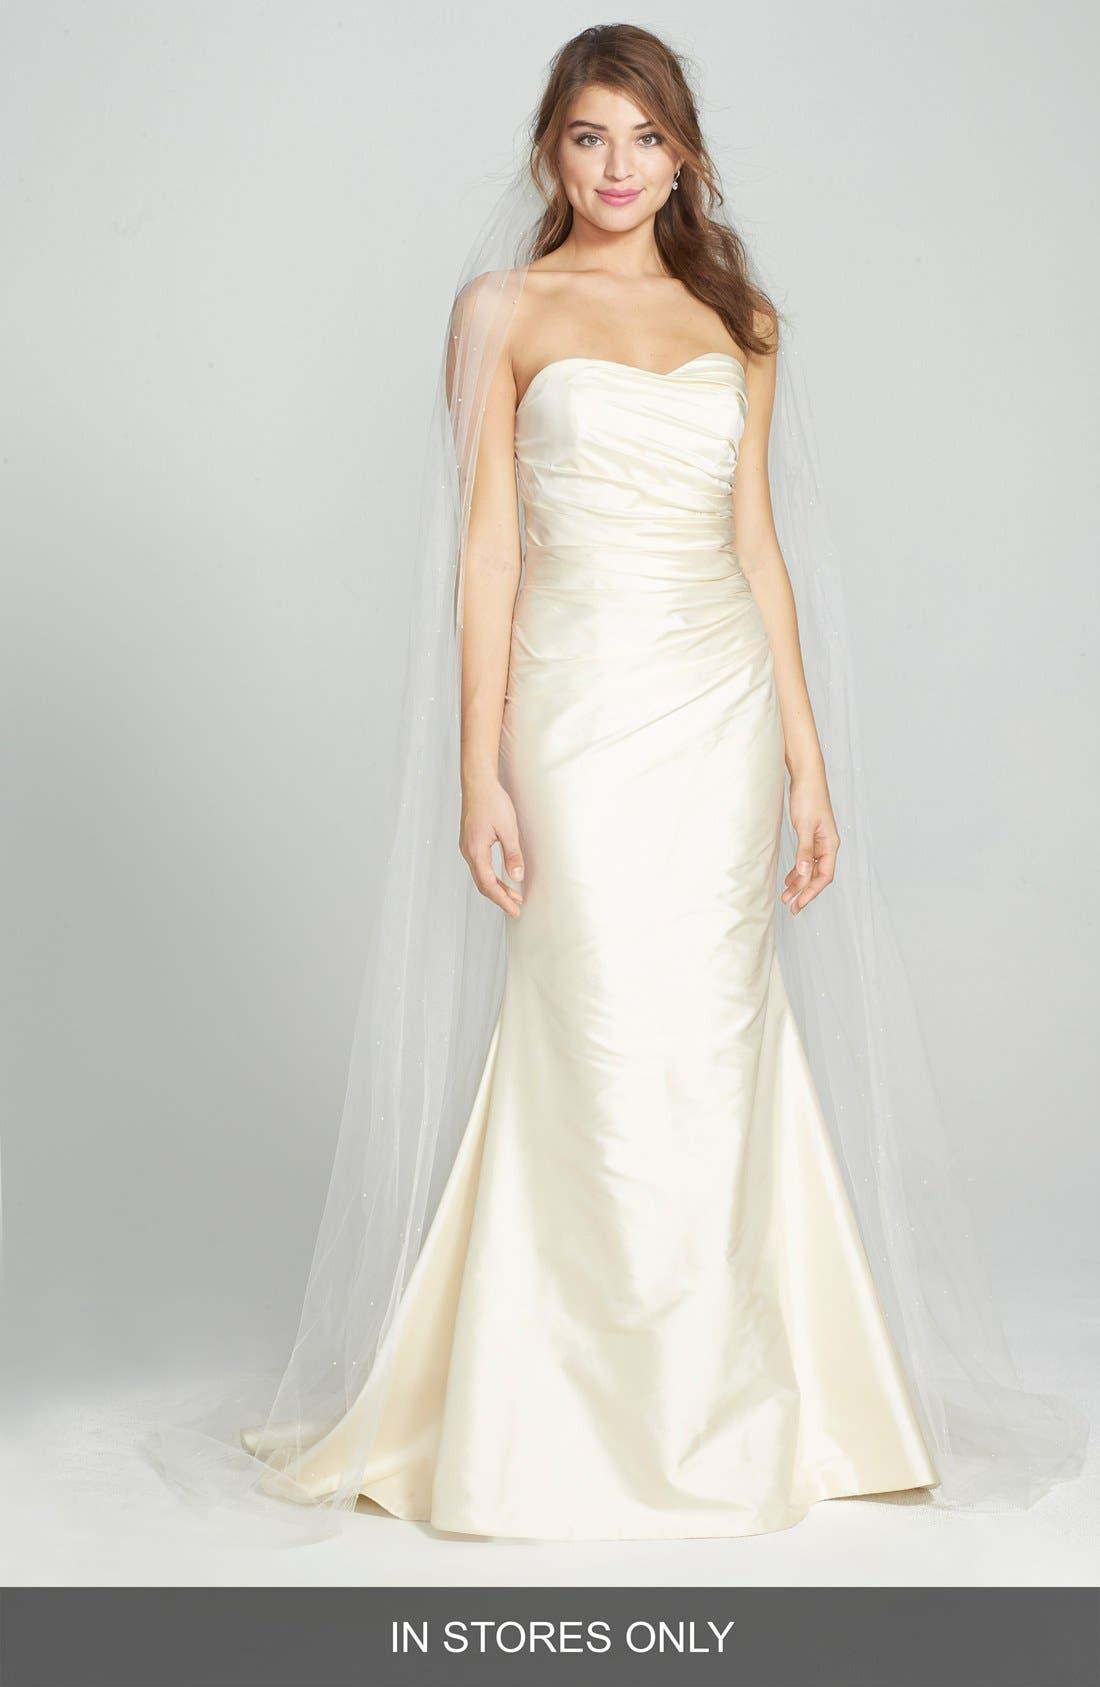 CAROLINE DEVILLO 'Kate' Ruched Silk Dupioni Mermaid Dress